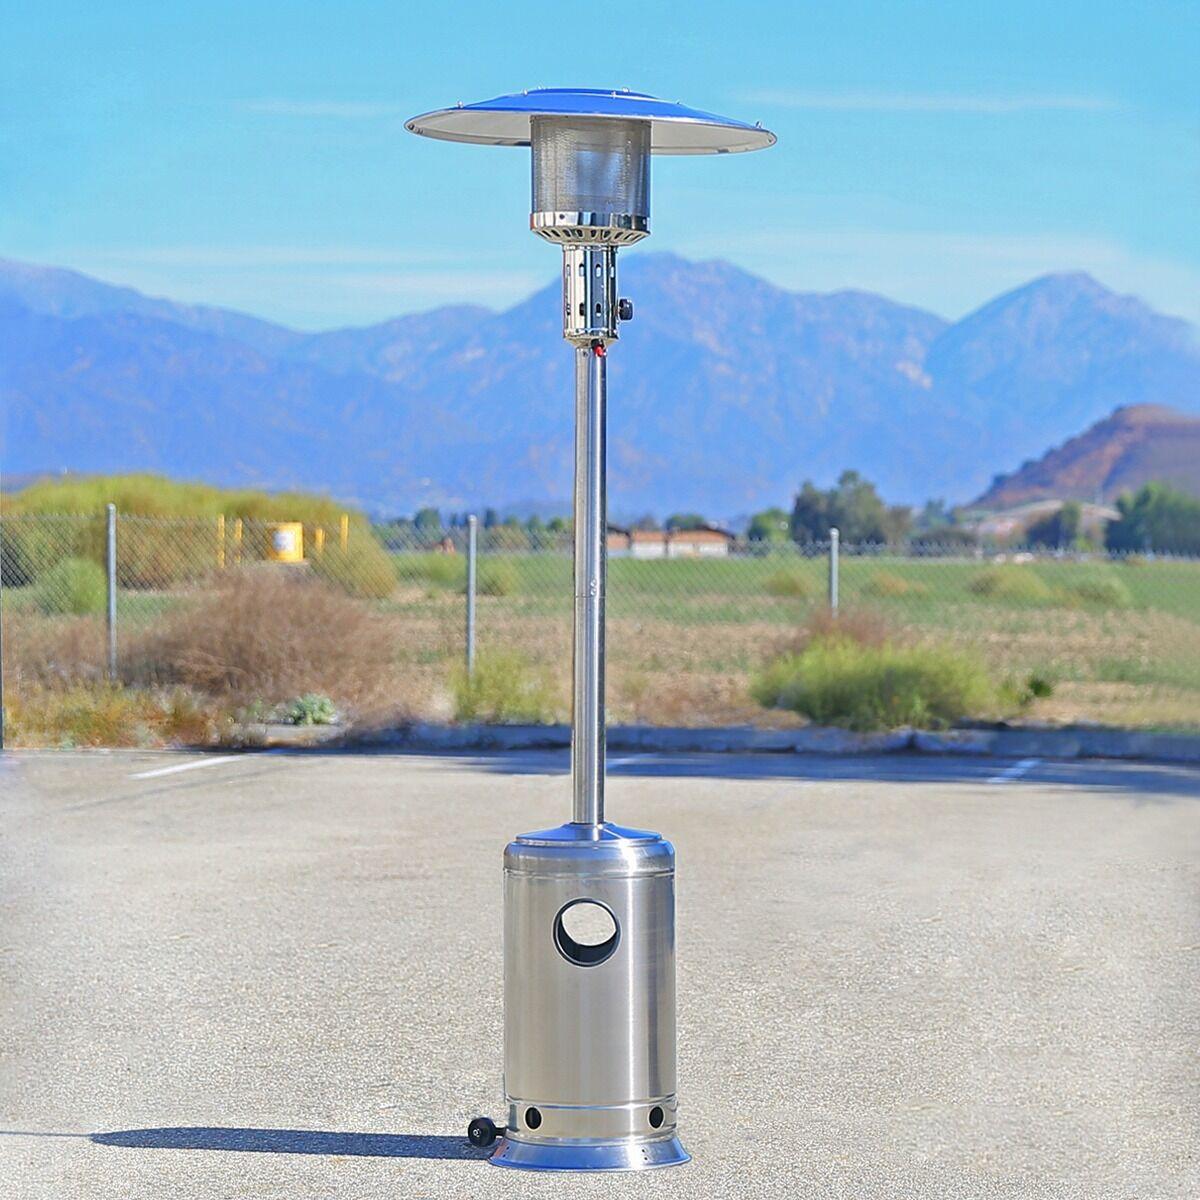 Outdoor Gas Lamp Repair Near Me: Garden Outdoor Patio Heater Propane Standing Stainless